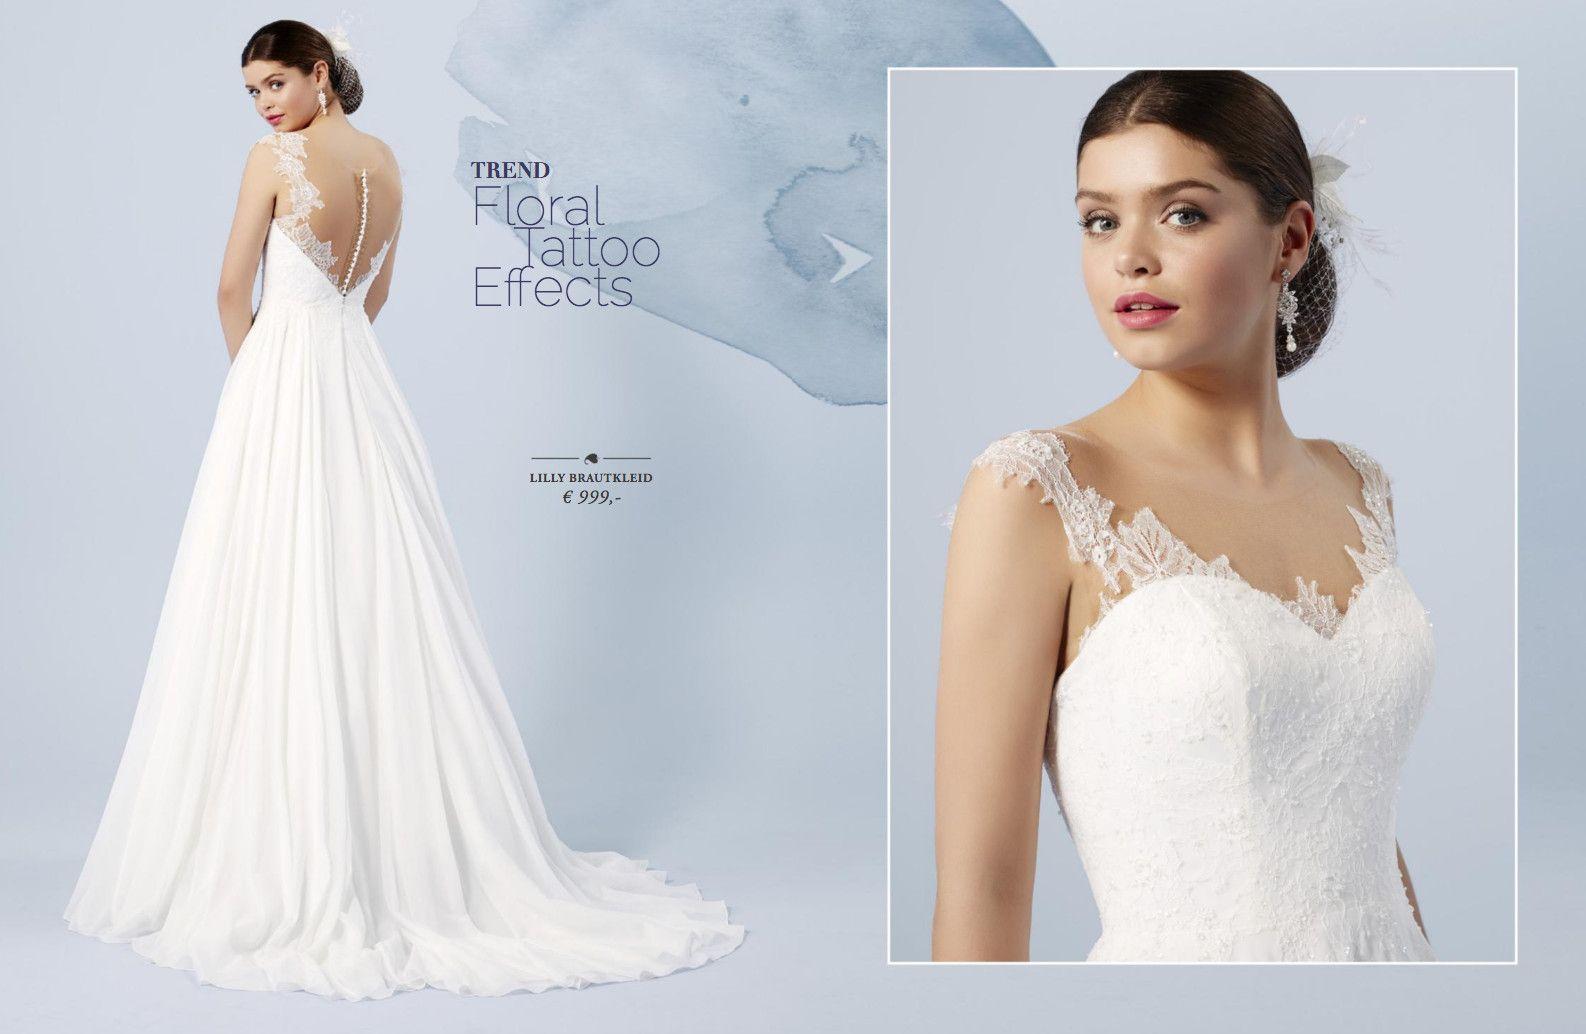 Brautmode Katalog Inspirational Brautkleider Katalog Bestellen Brautmoden Katalog Online Dengan Gambar